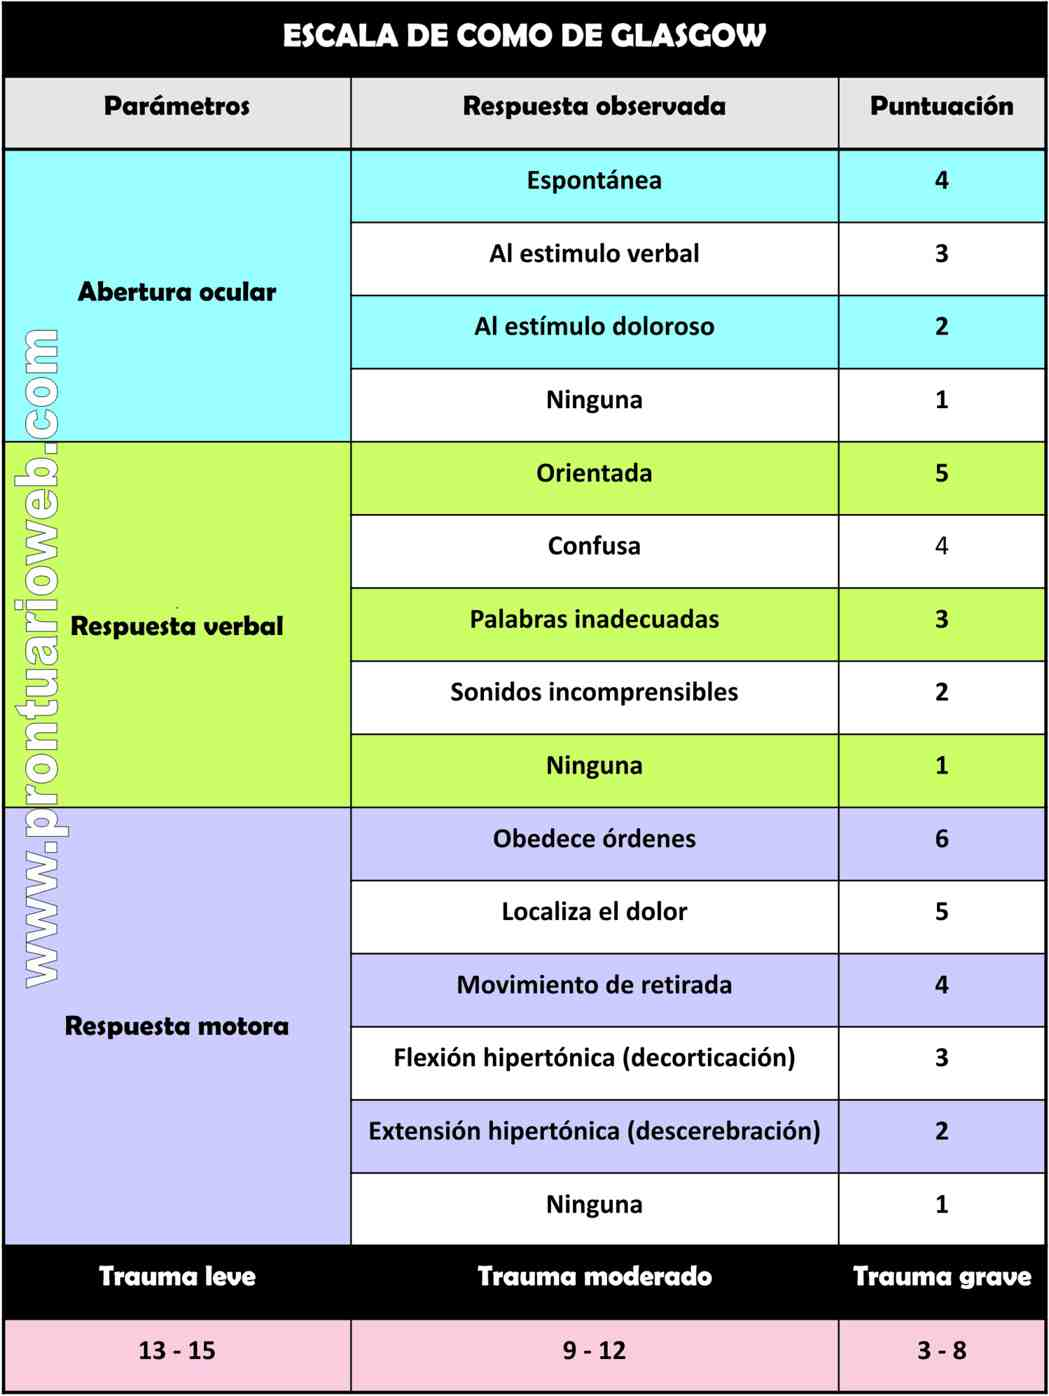 escala-de-coma-de-glasgow-español-prontuarioweb.jpg